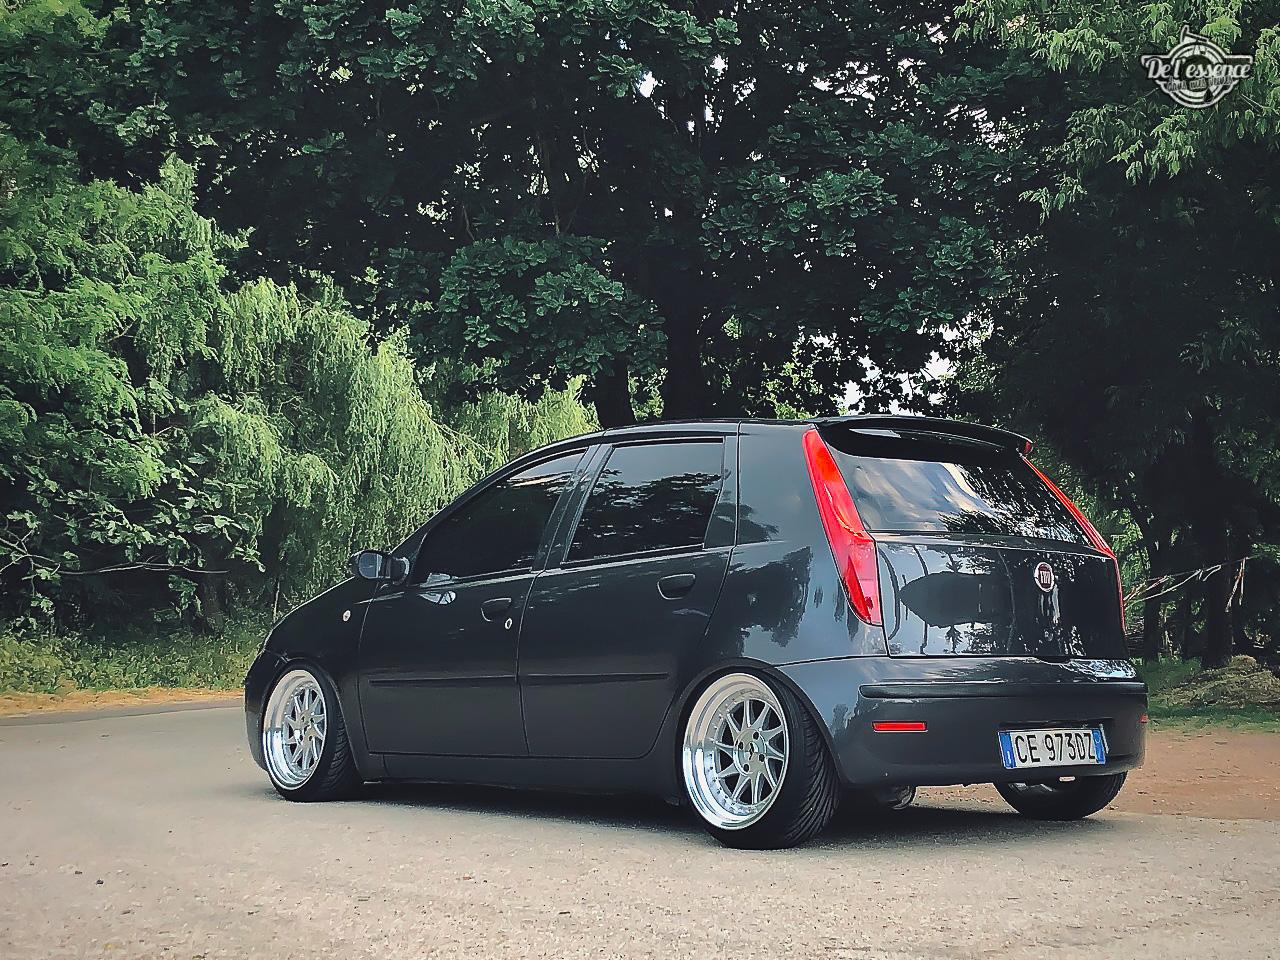 #Stance Discount - Buccaccio Gang #2 - Fiat Punto II 2